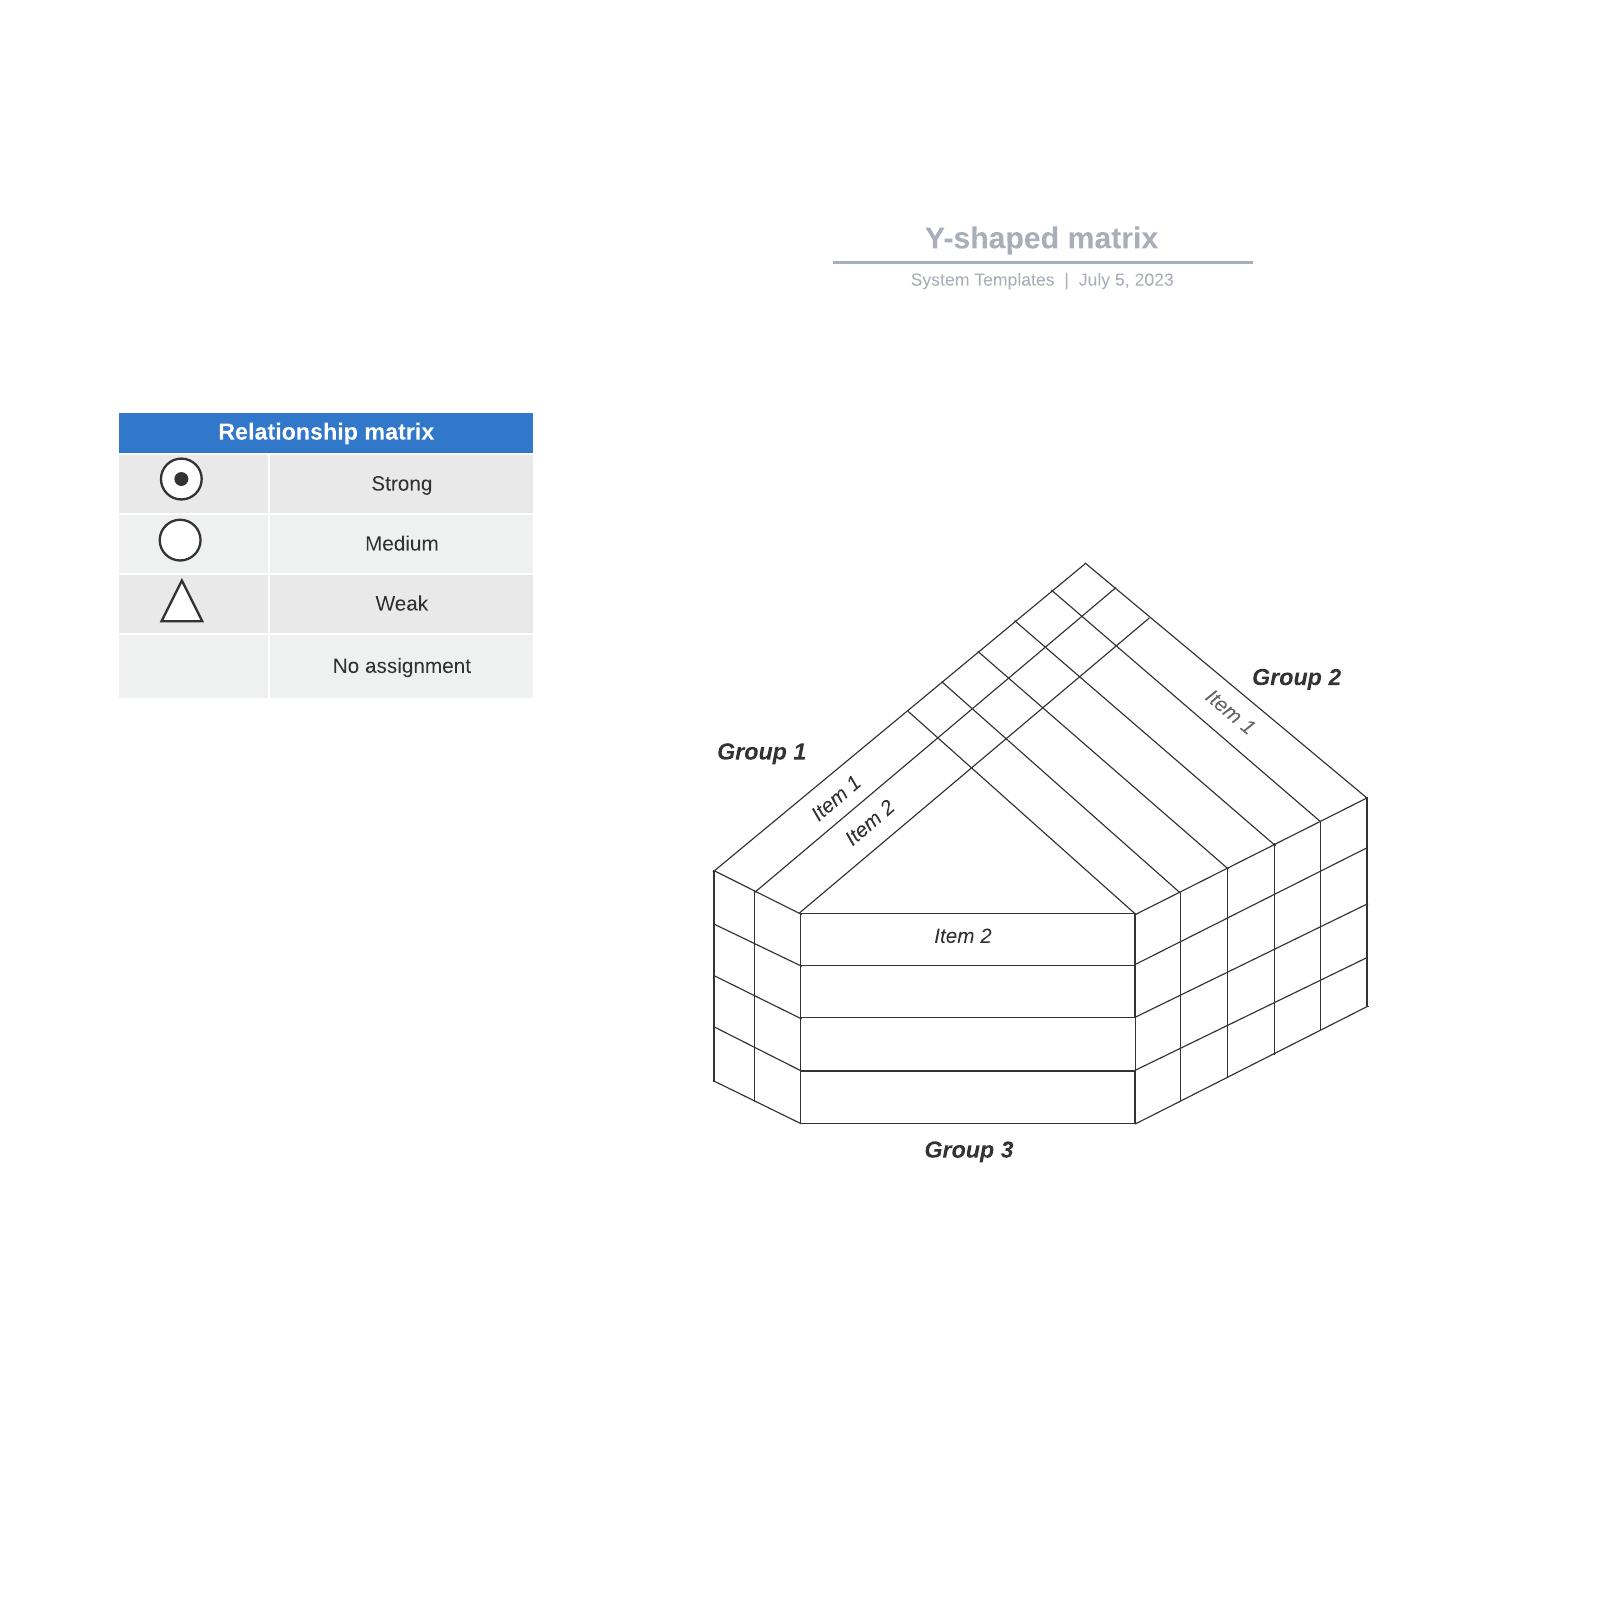 Y-shaped matrix